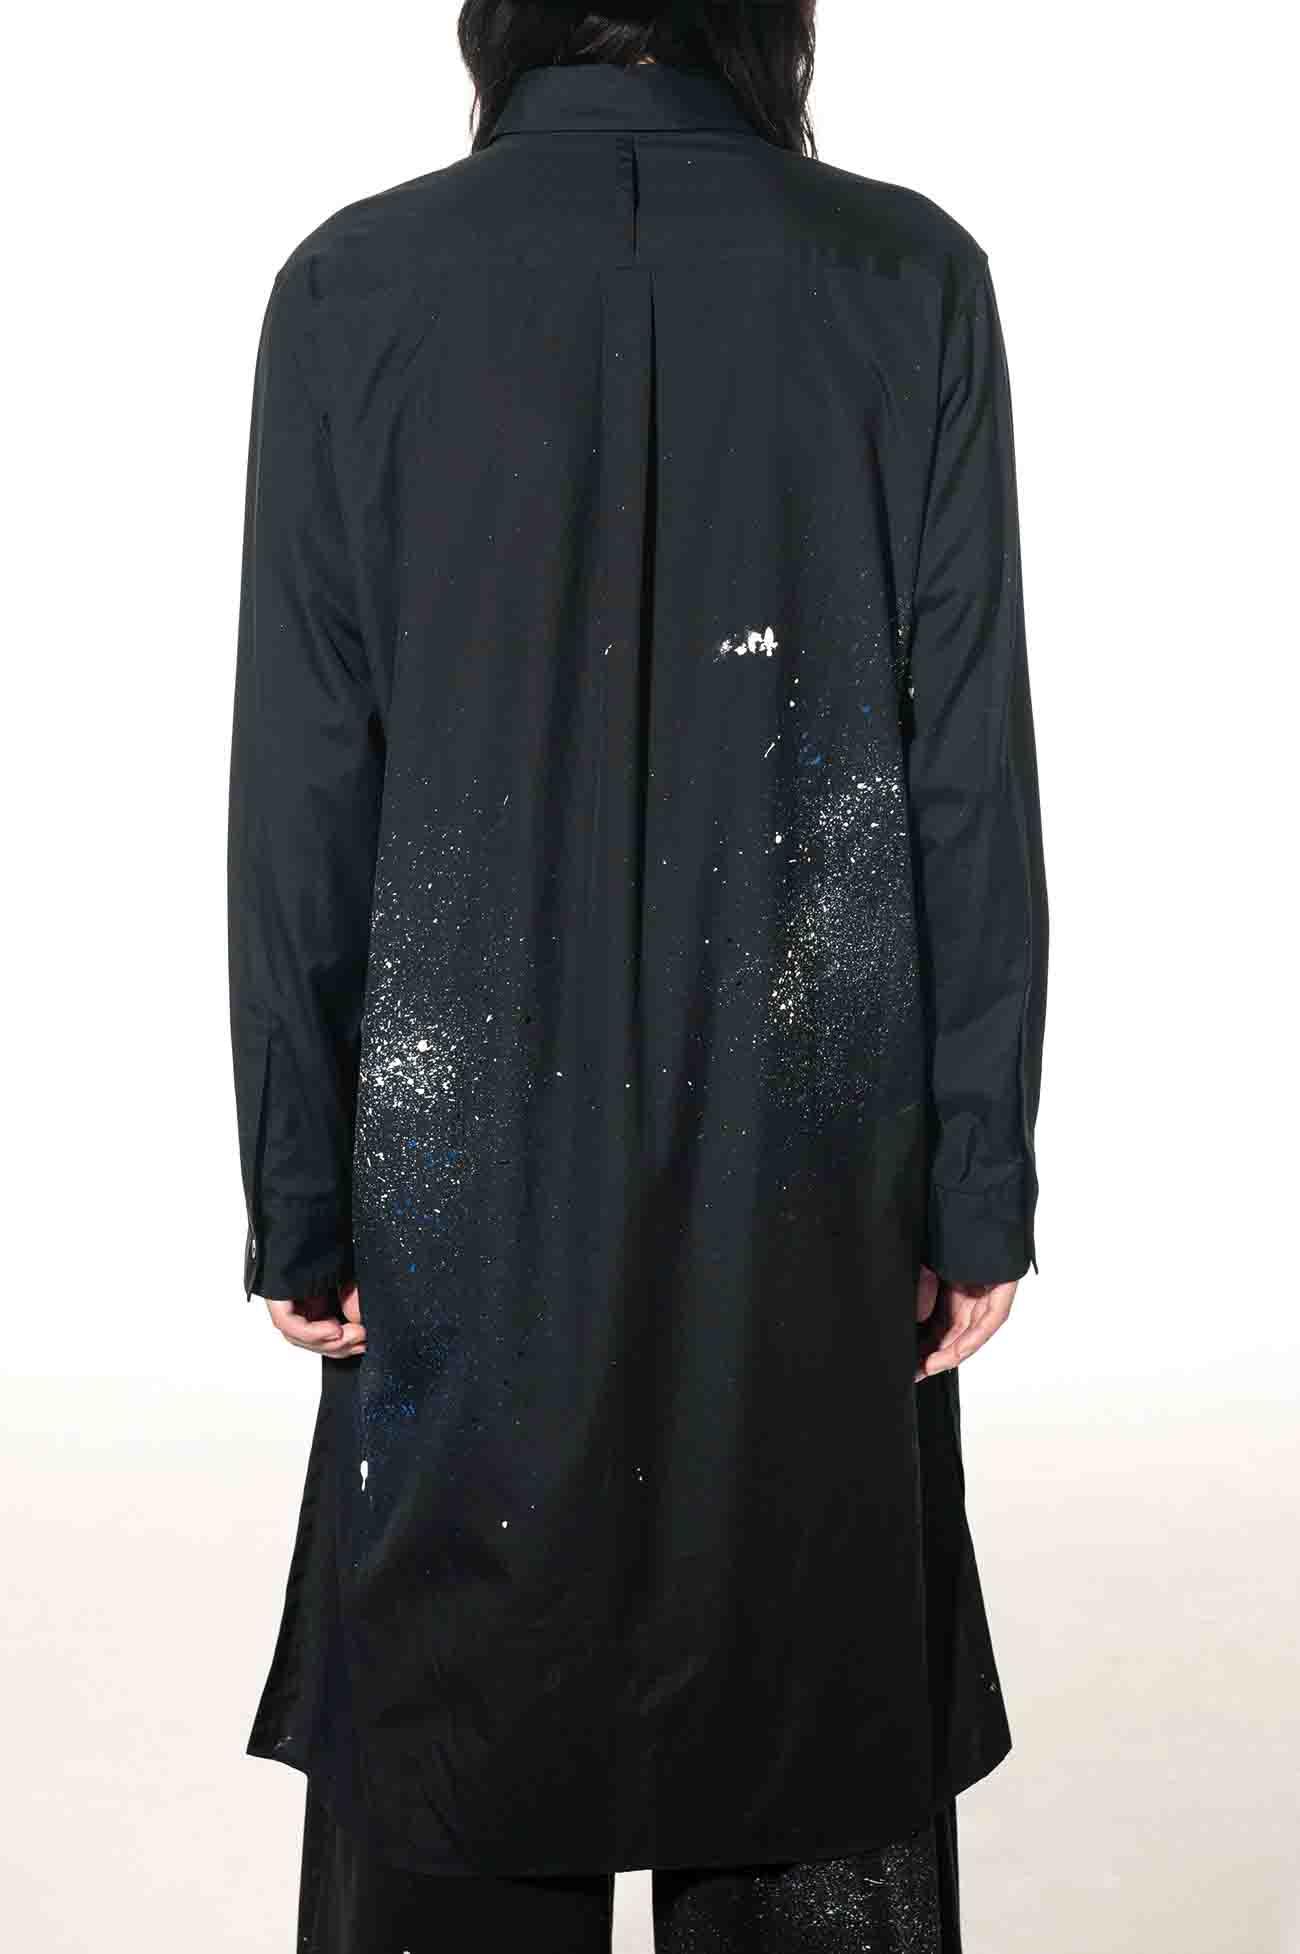 100/2 Broad Splash Paint Processing Long Shirt